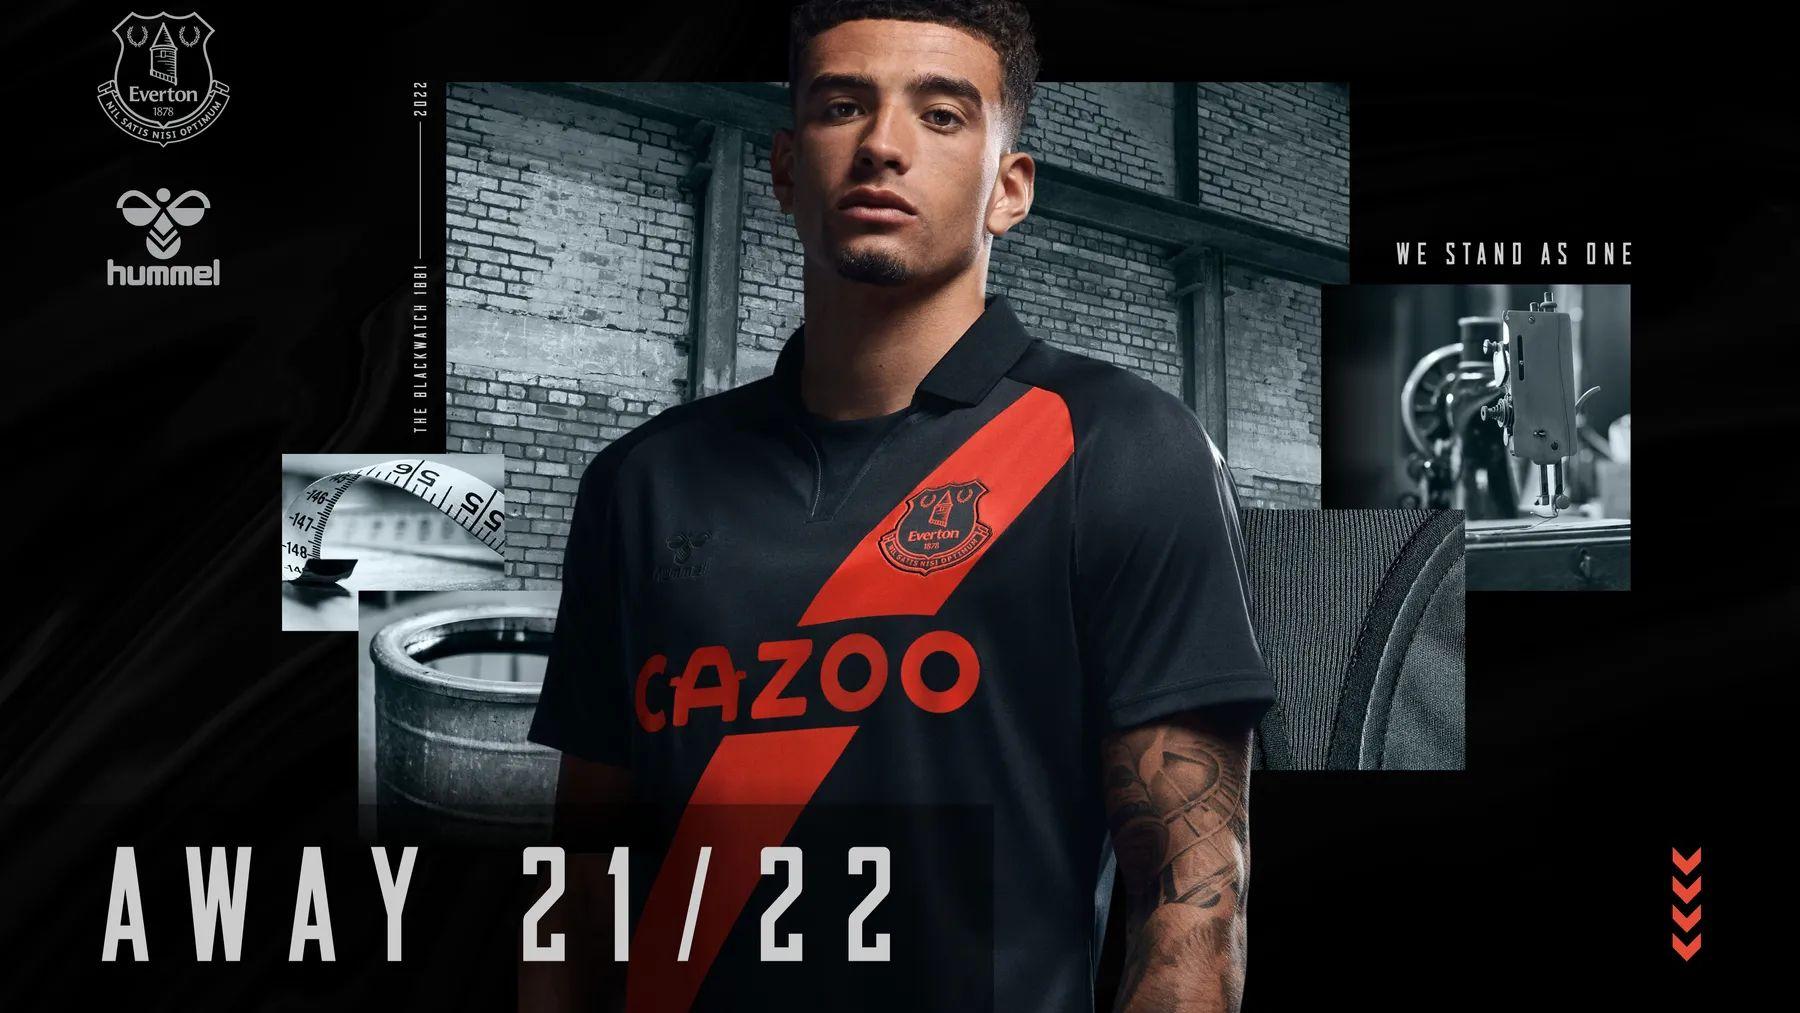 Everton 2021-22 Hummel Away Kit | 21/22 Kits | Football shirt blog